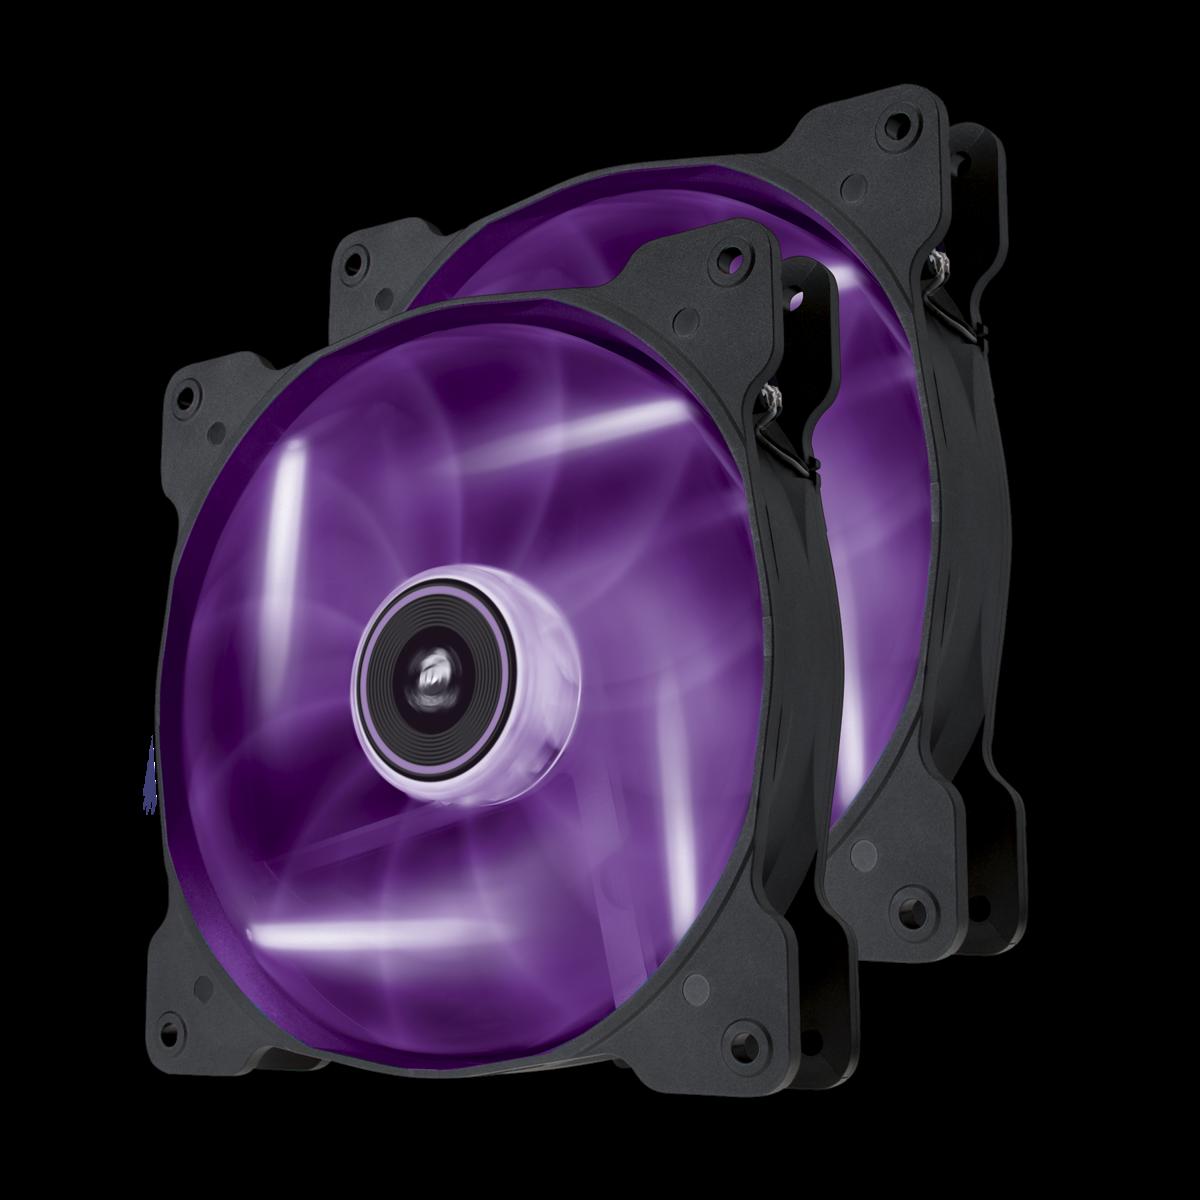 Ventilator Corsair Air Series SP140 LED Purple High Static Pressure 140mm Fan Twin Pack